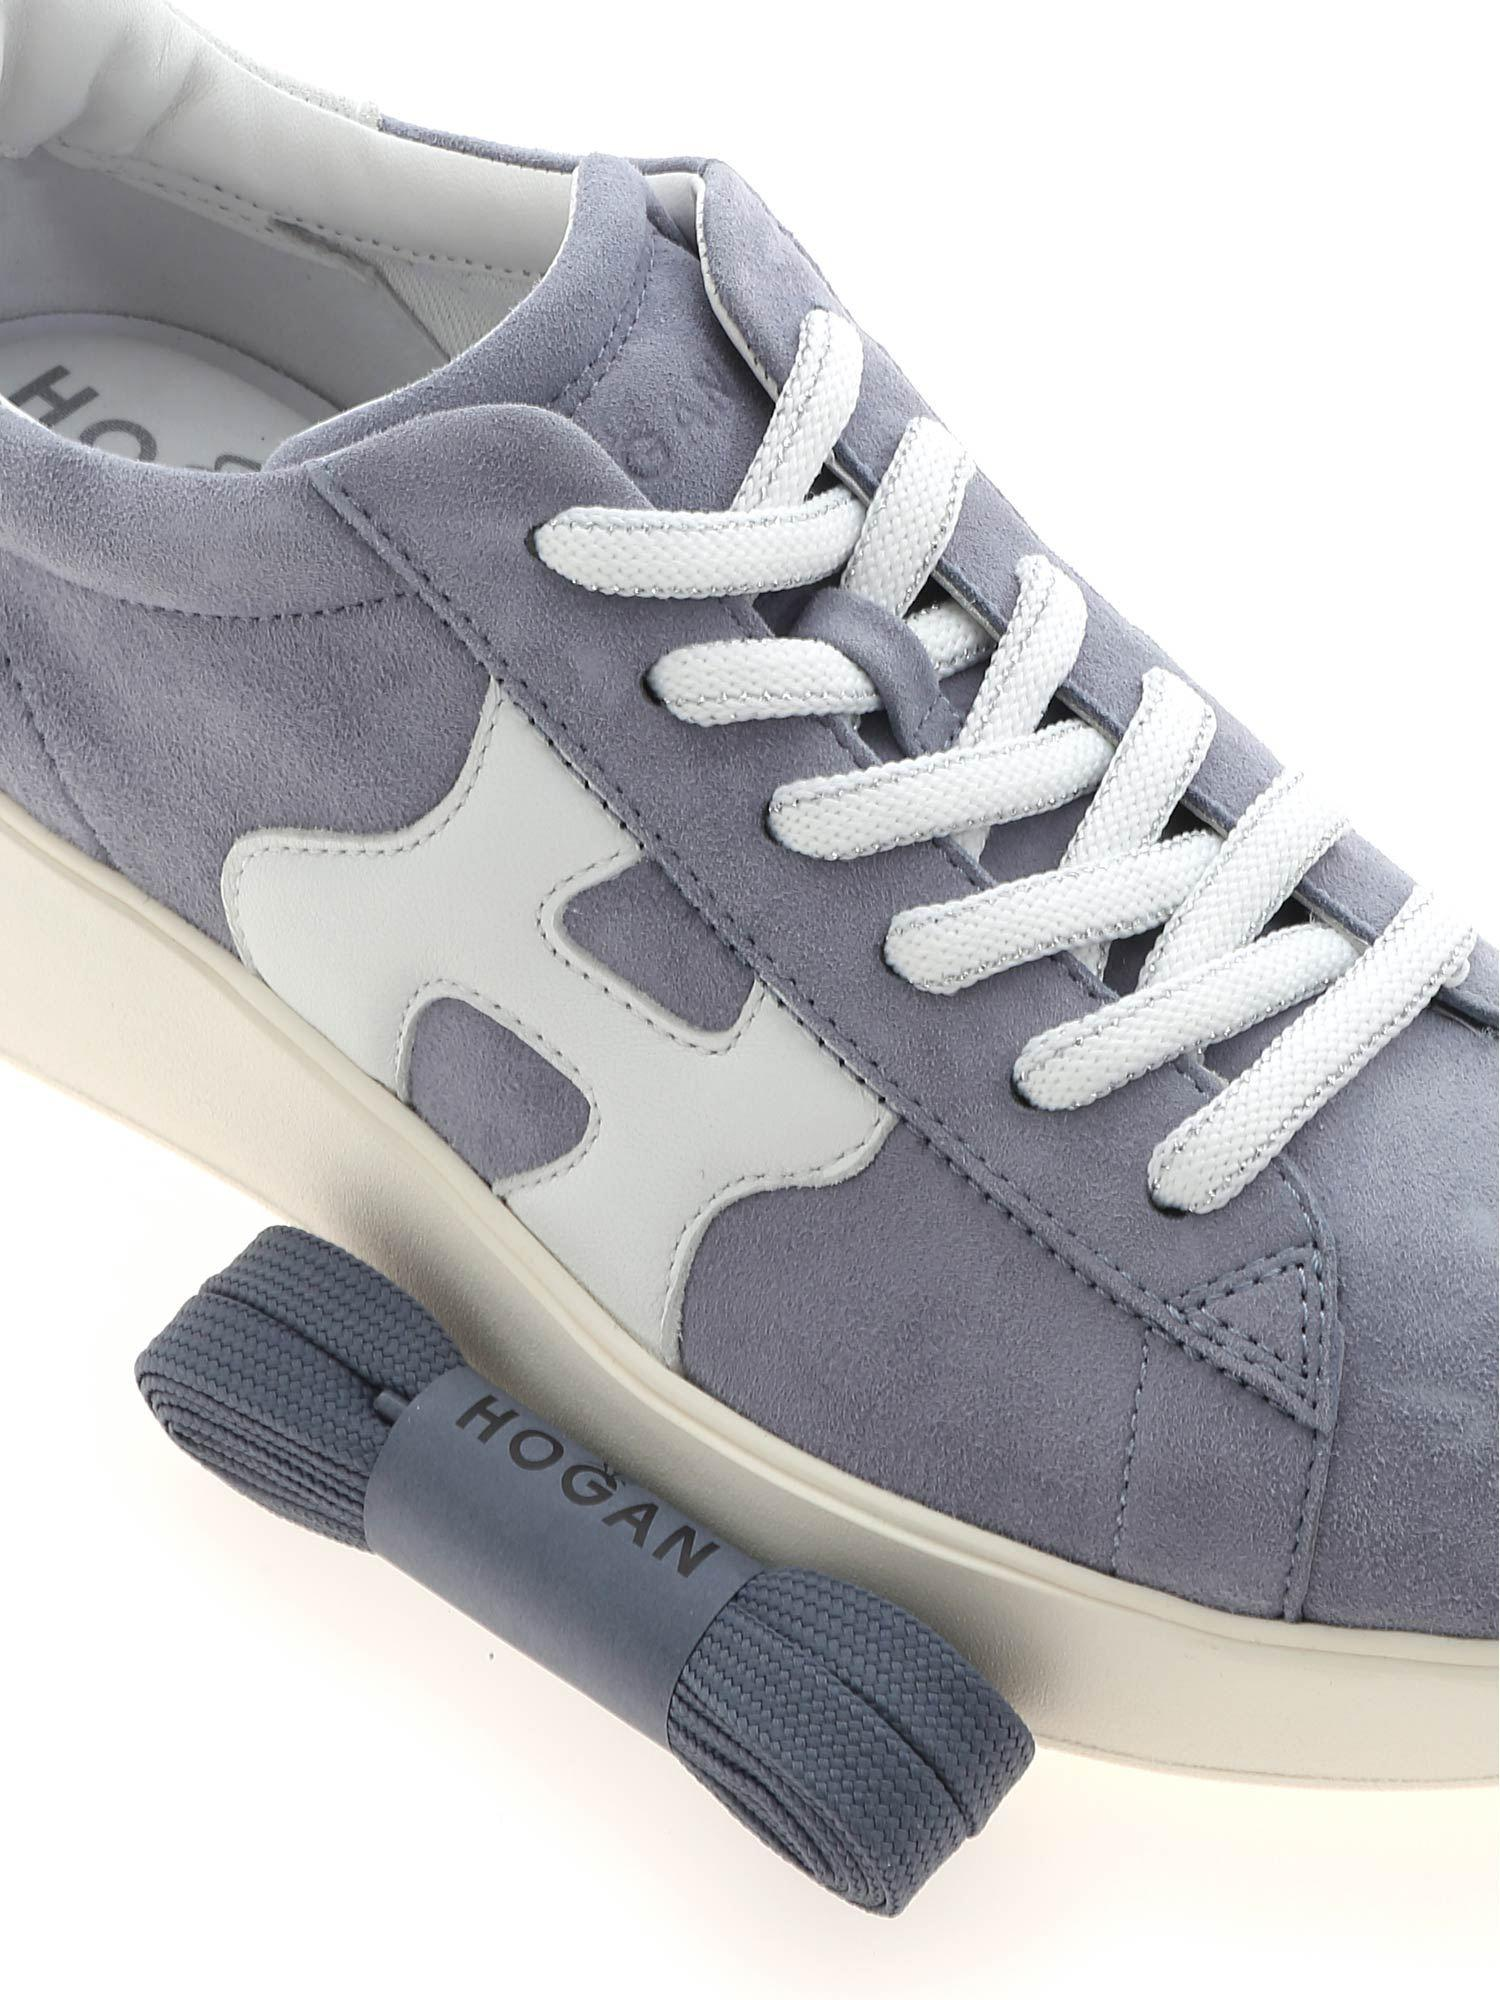 Hogan Suede H562 Sneakers in Light Blue (Blue) - Lyst